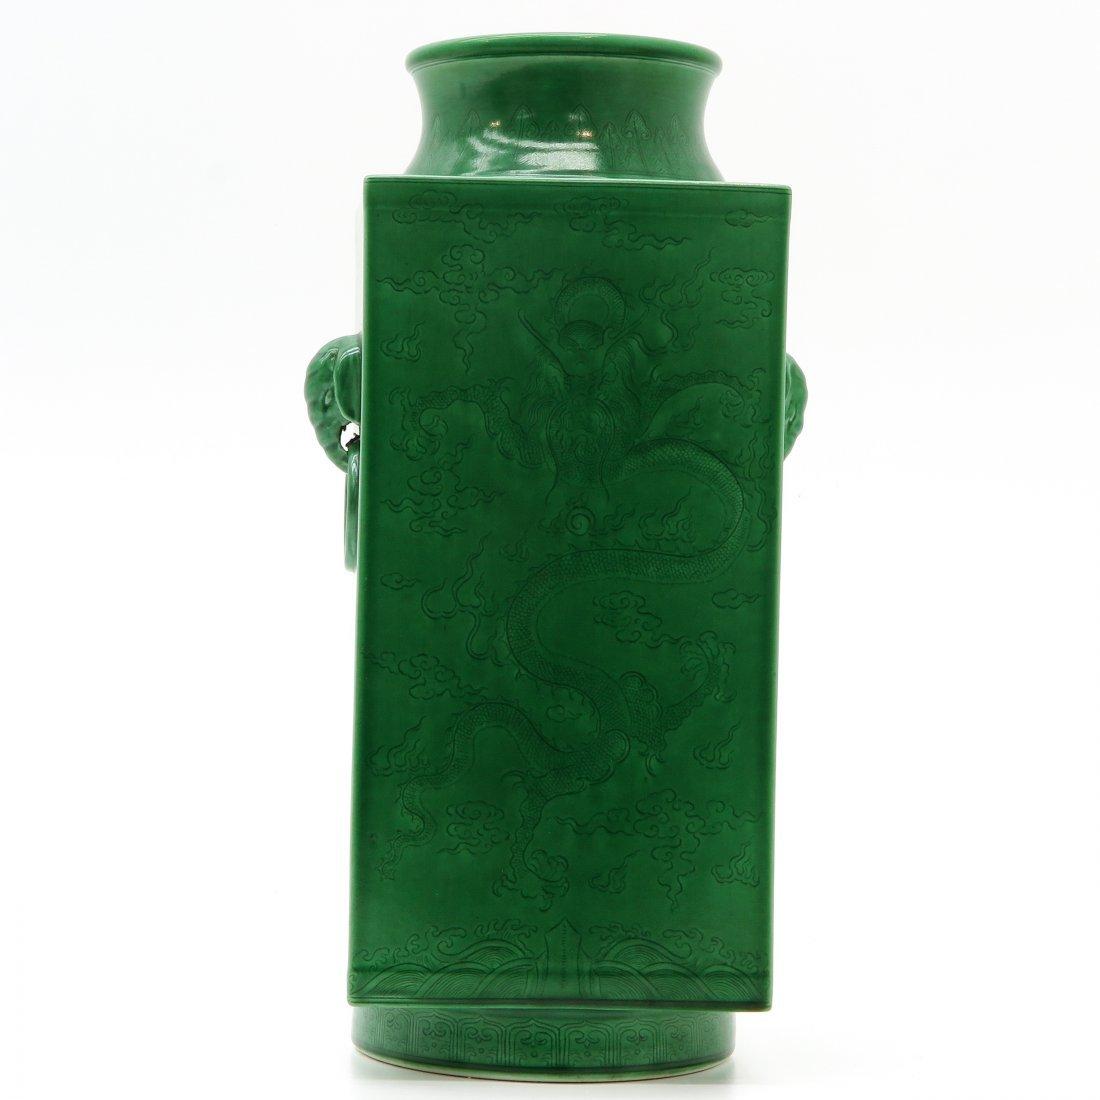 China Porcelain Green Glaze Vase